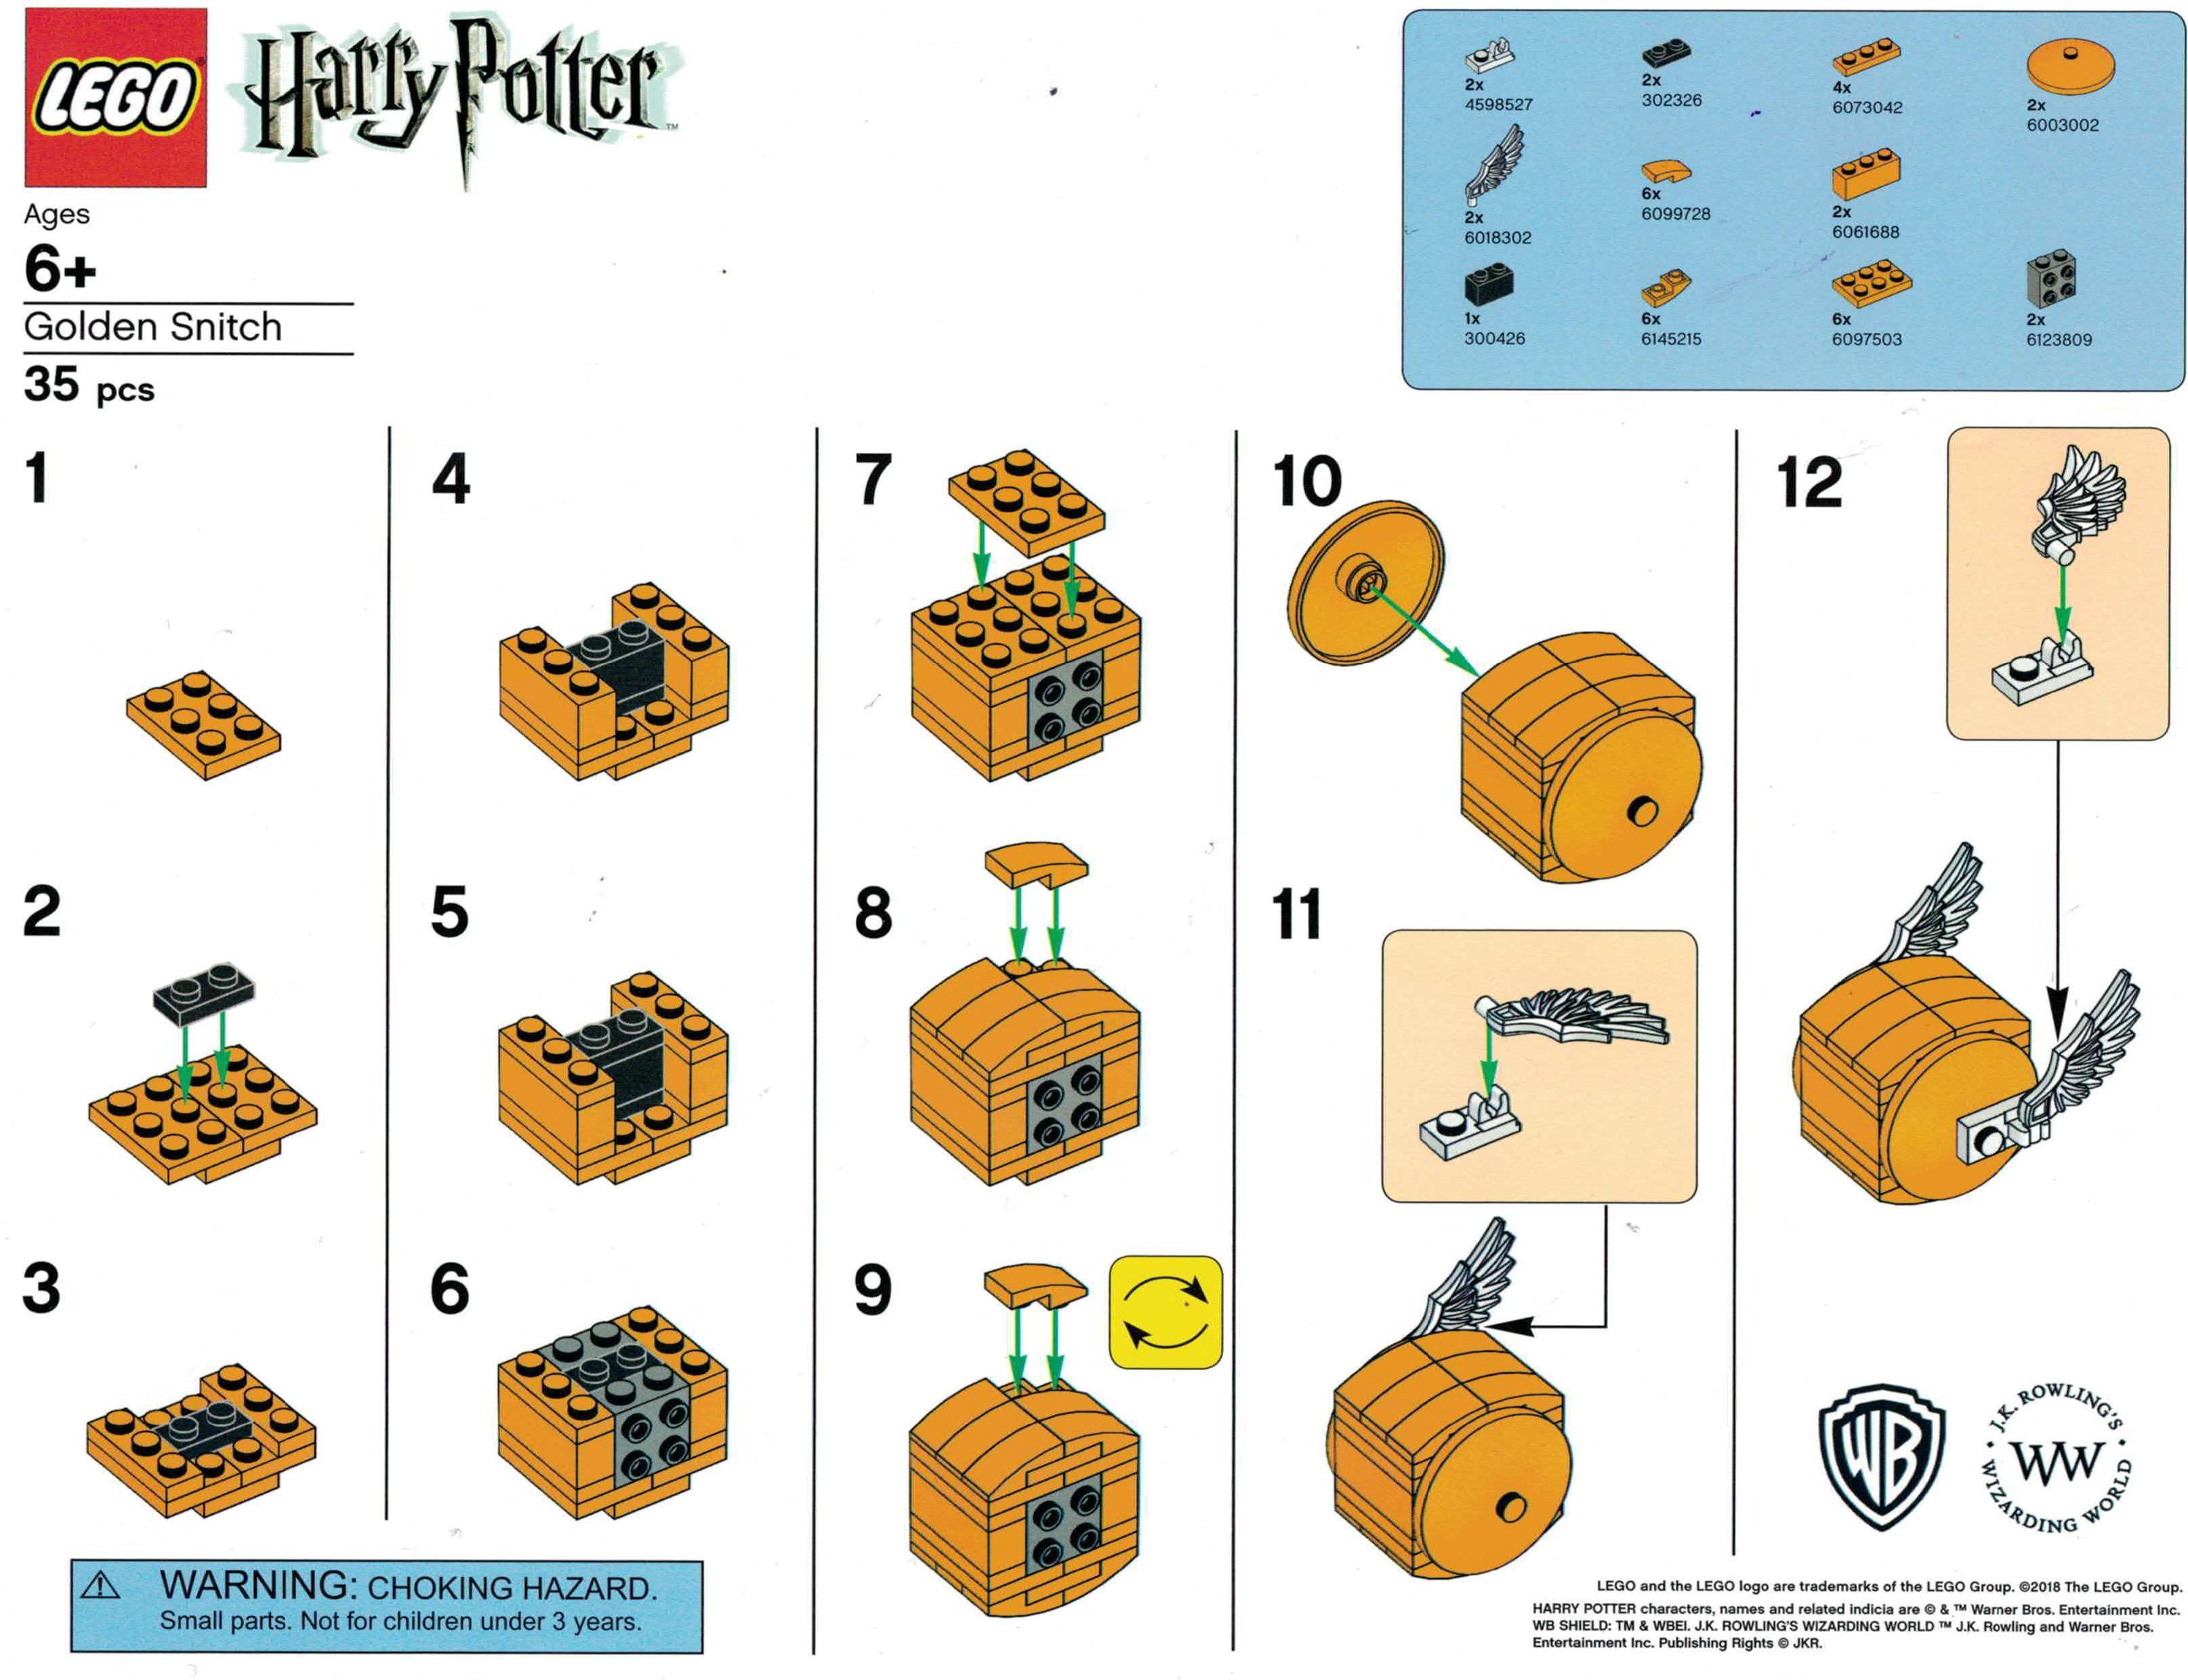 lego-harry-potter-der-goldene-schnatz-bauanleitung zusammengebaut.com